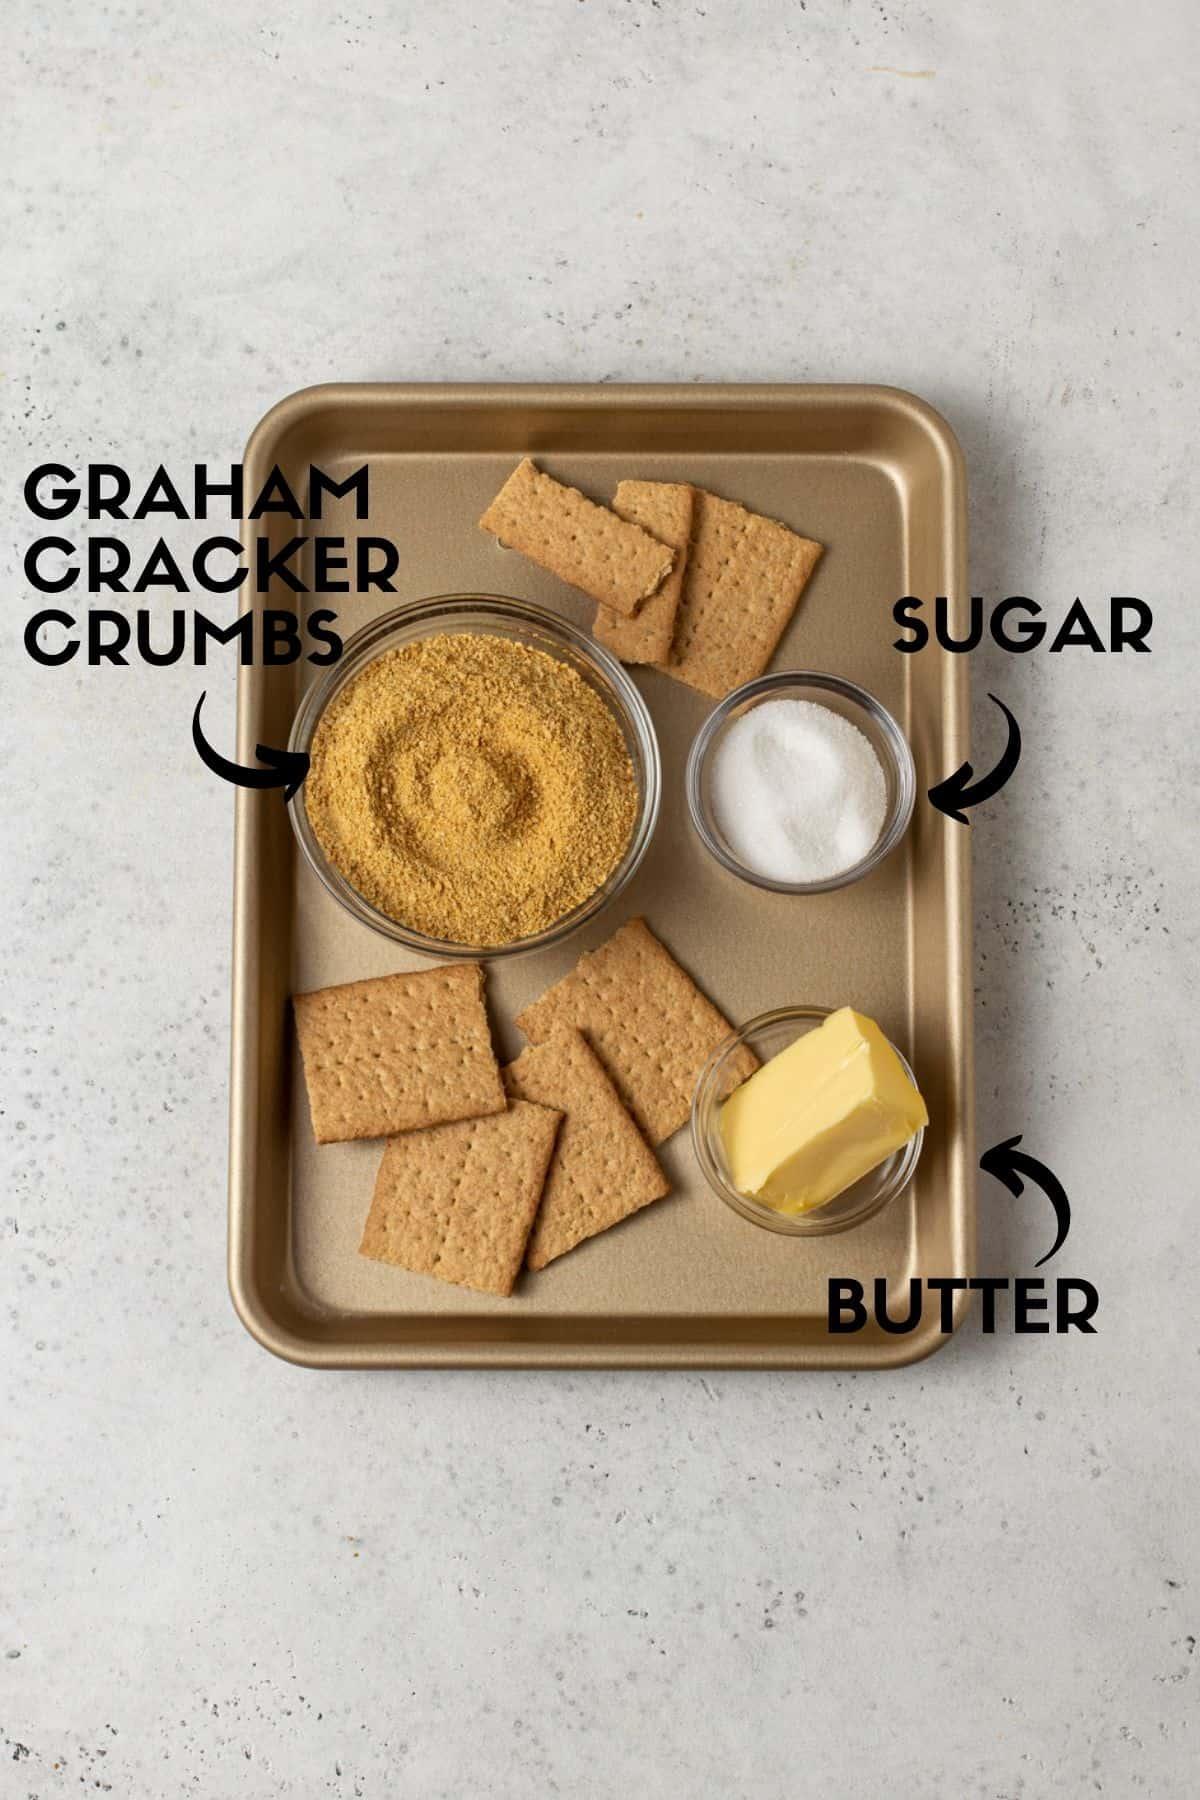 Graham cracker crust ingredients including graham cracker crumbs, sugar & butter.